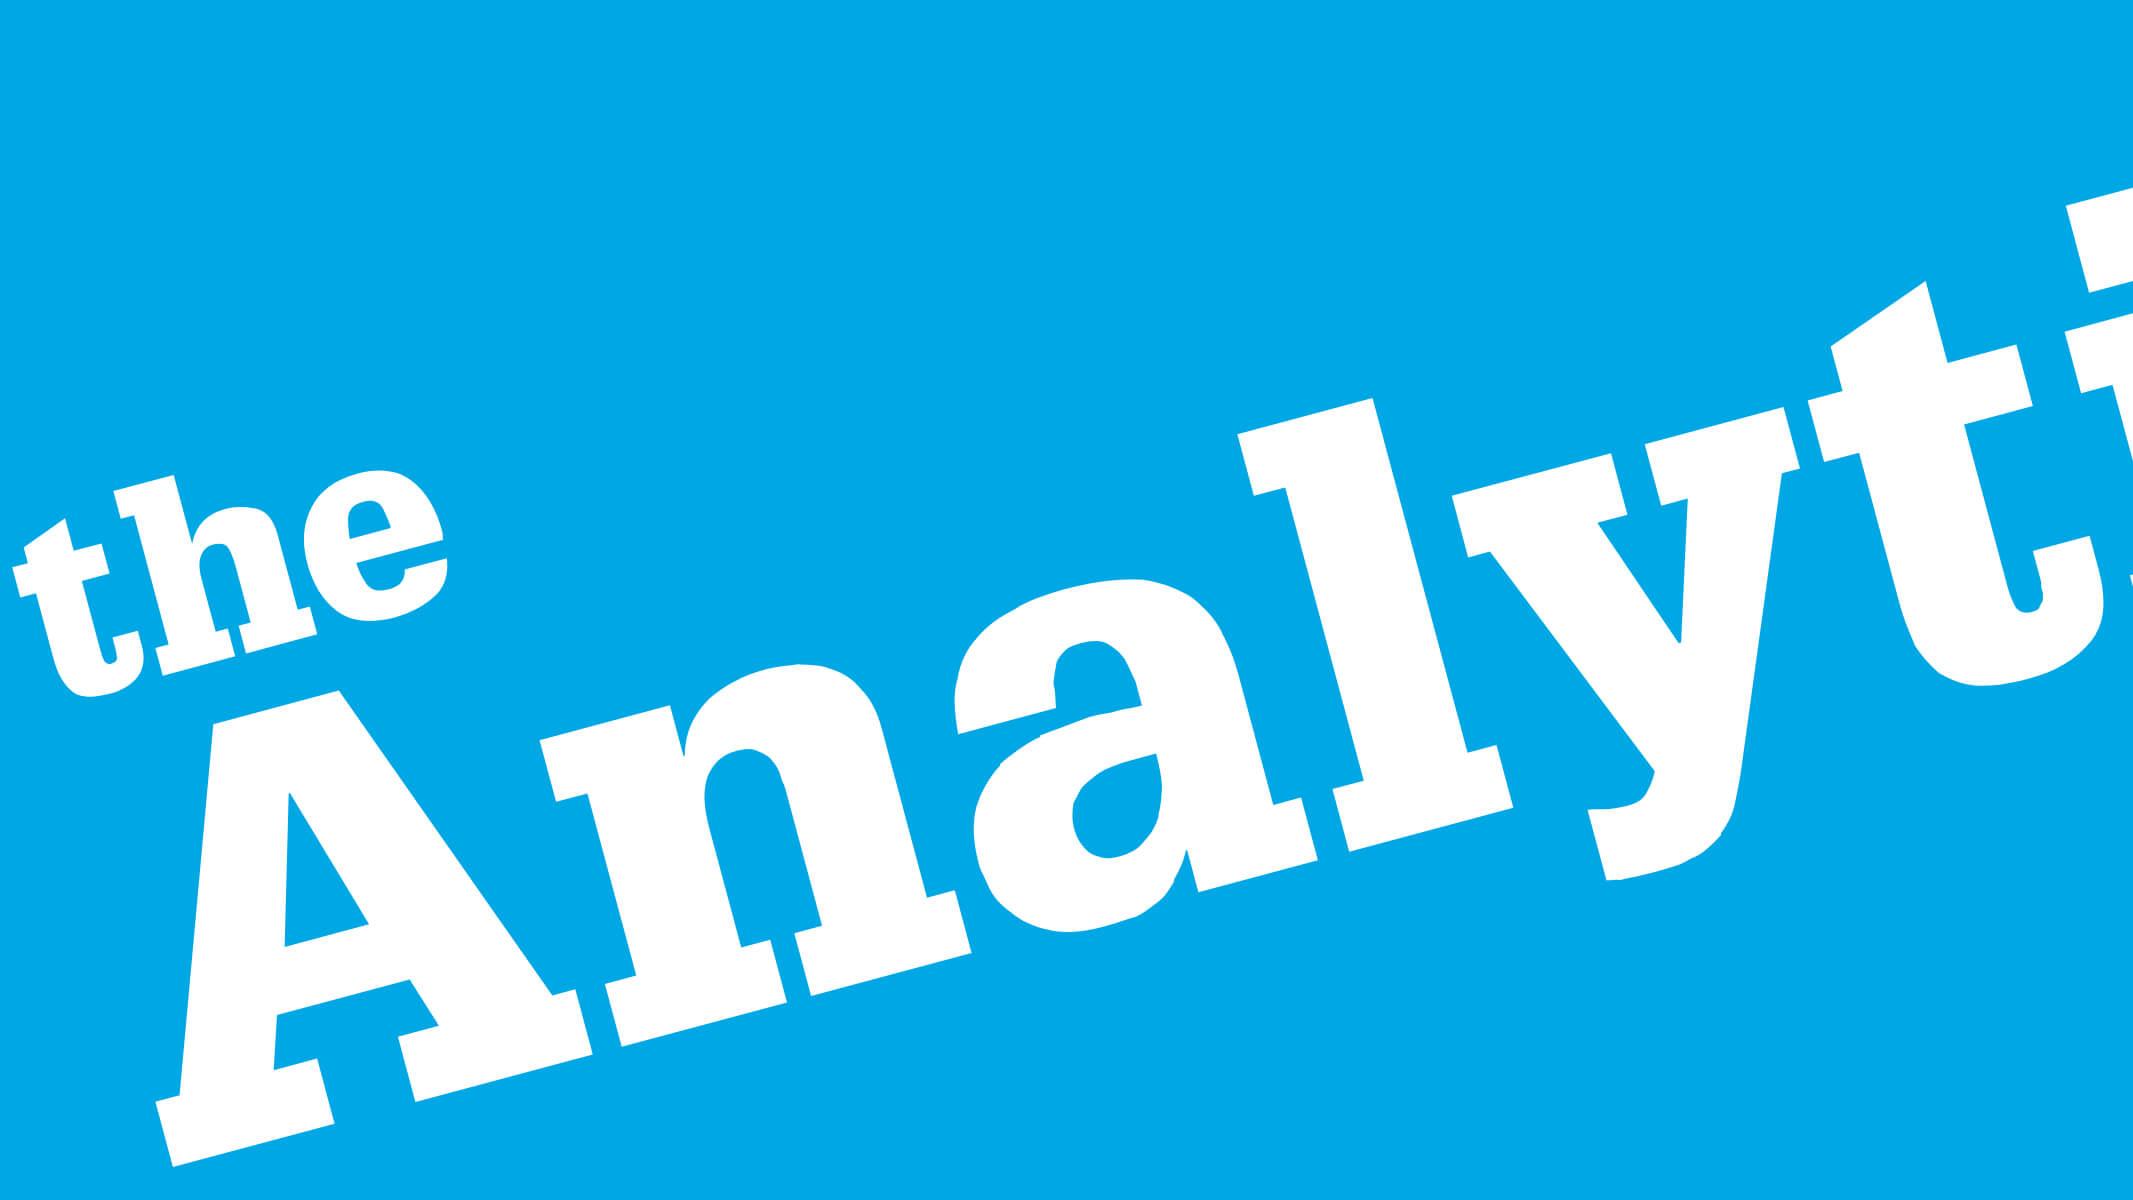 Simultaneous Analysis of Etizolam, Triazolam, and Their